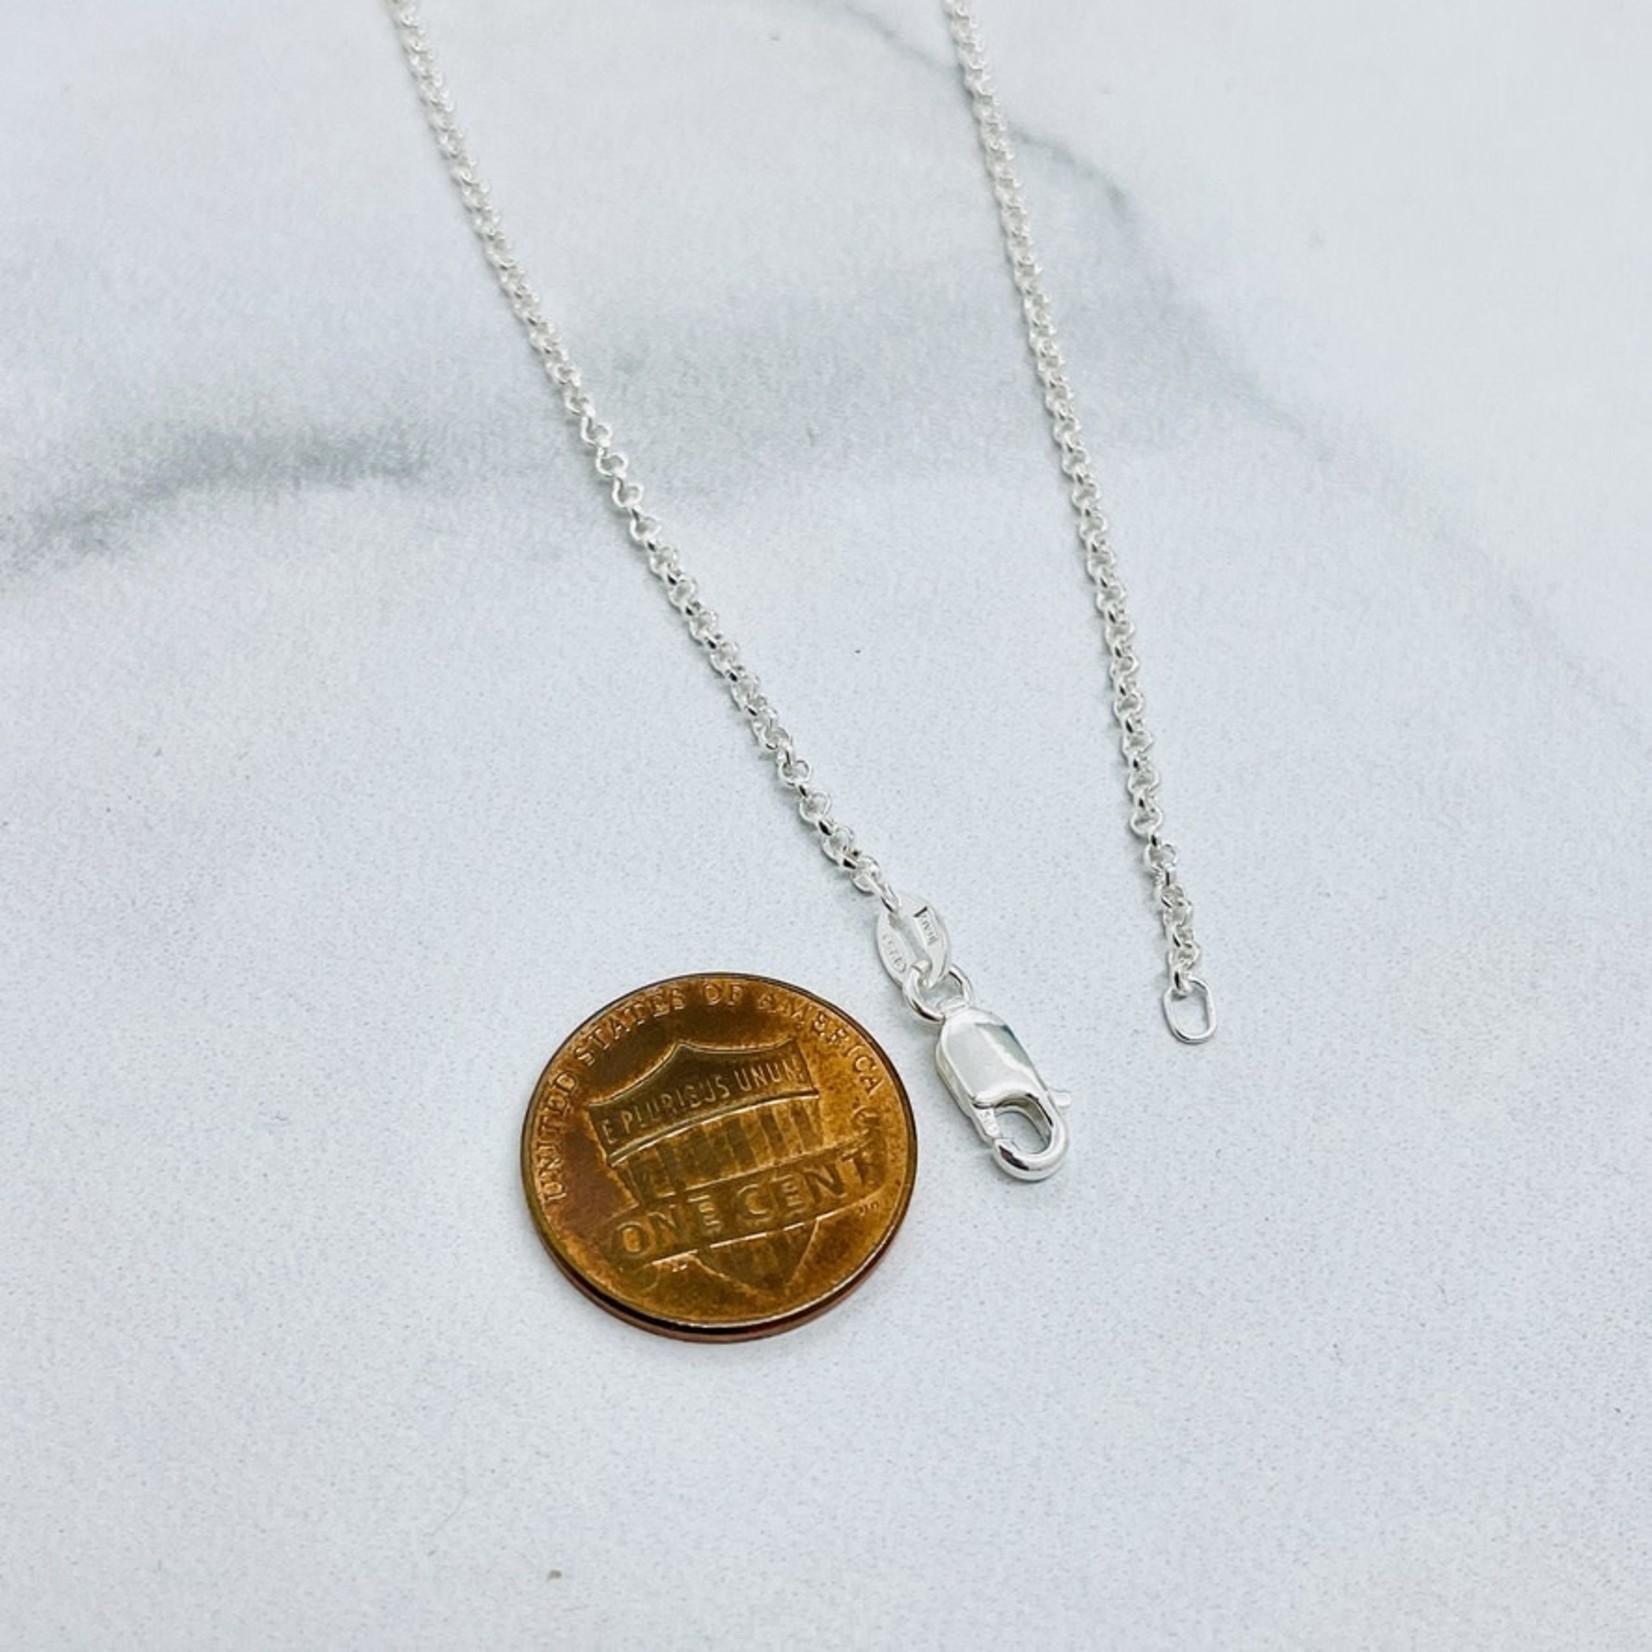 Silver Bramble Jewelry Handmade Rabbit Burrow Necklace in Silver